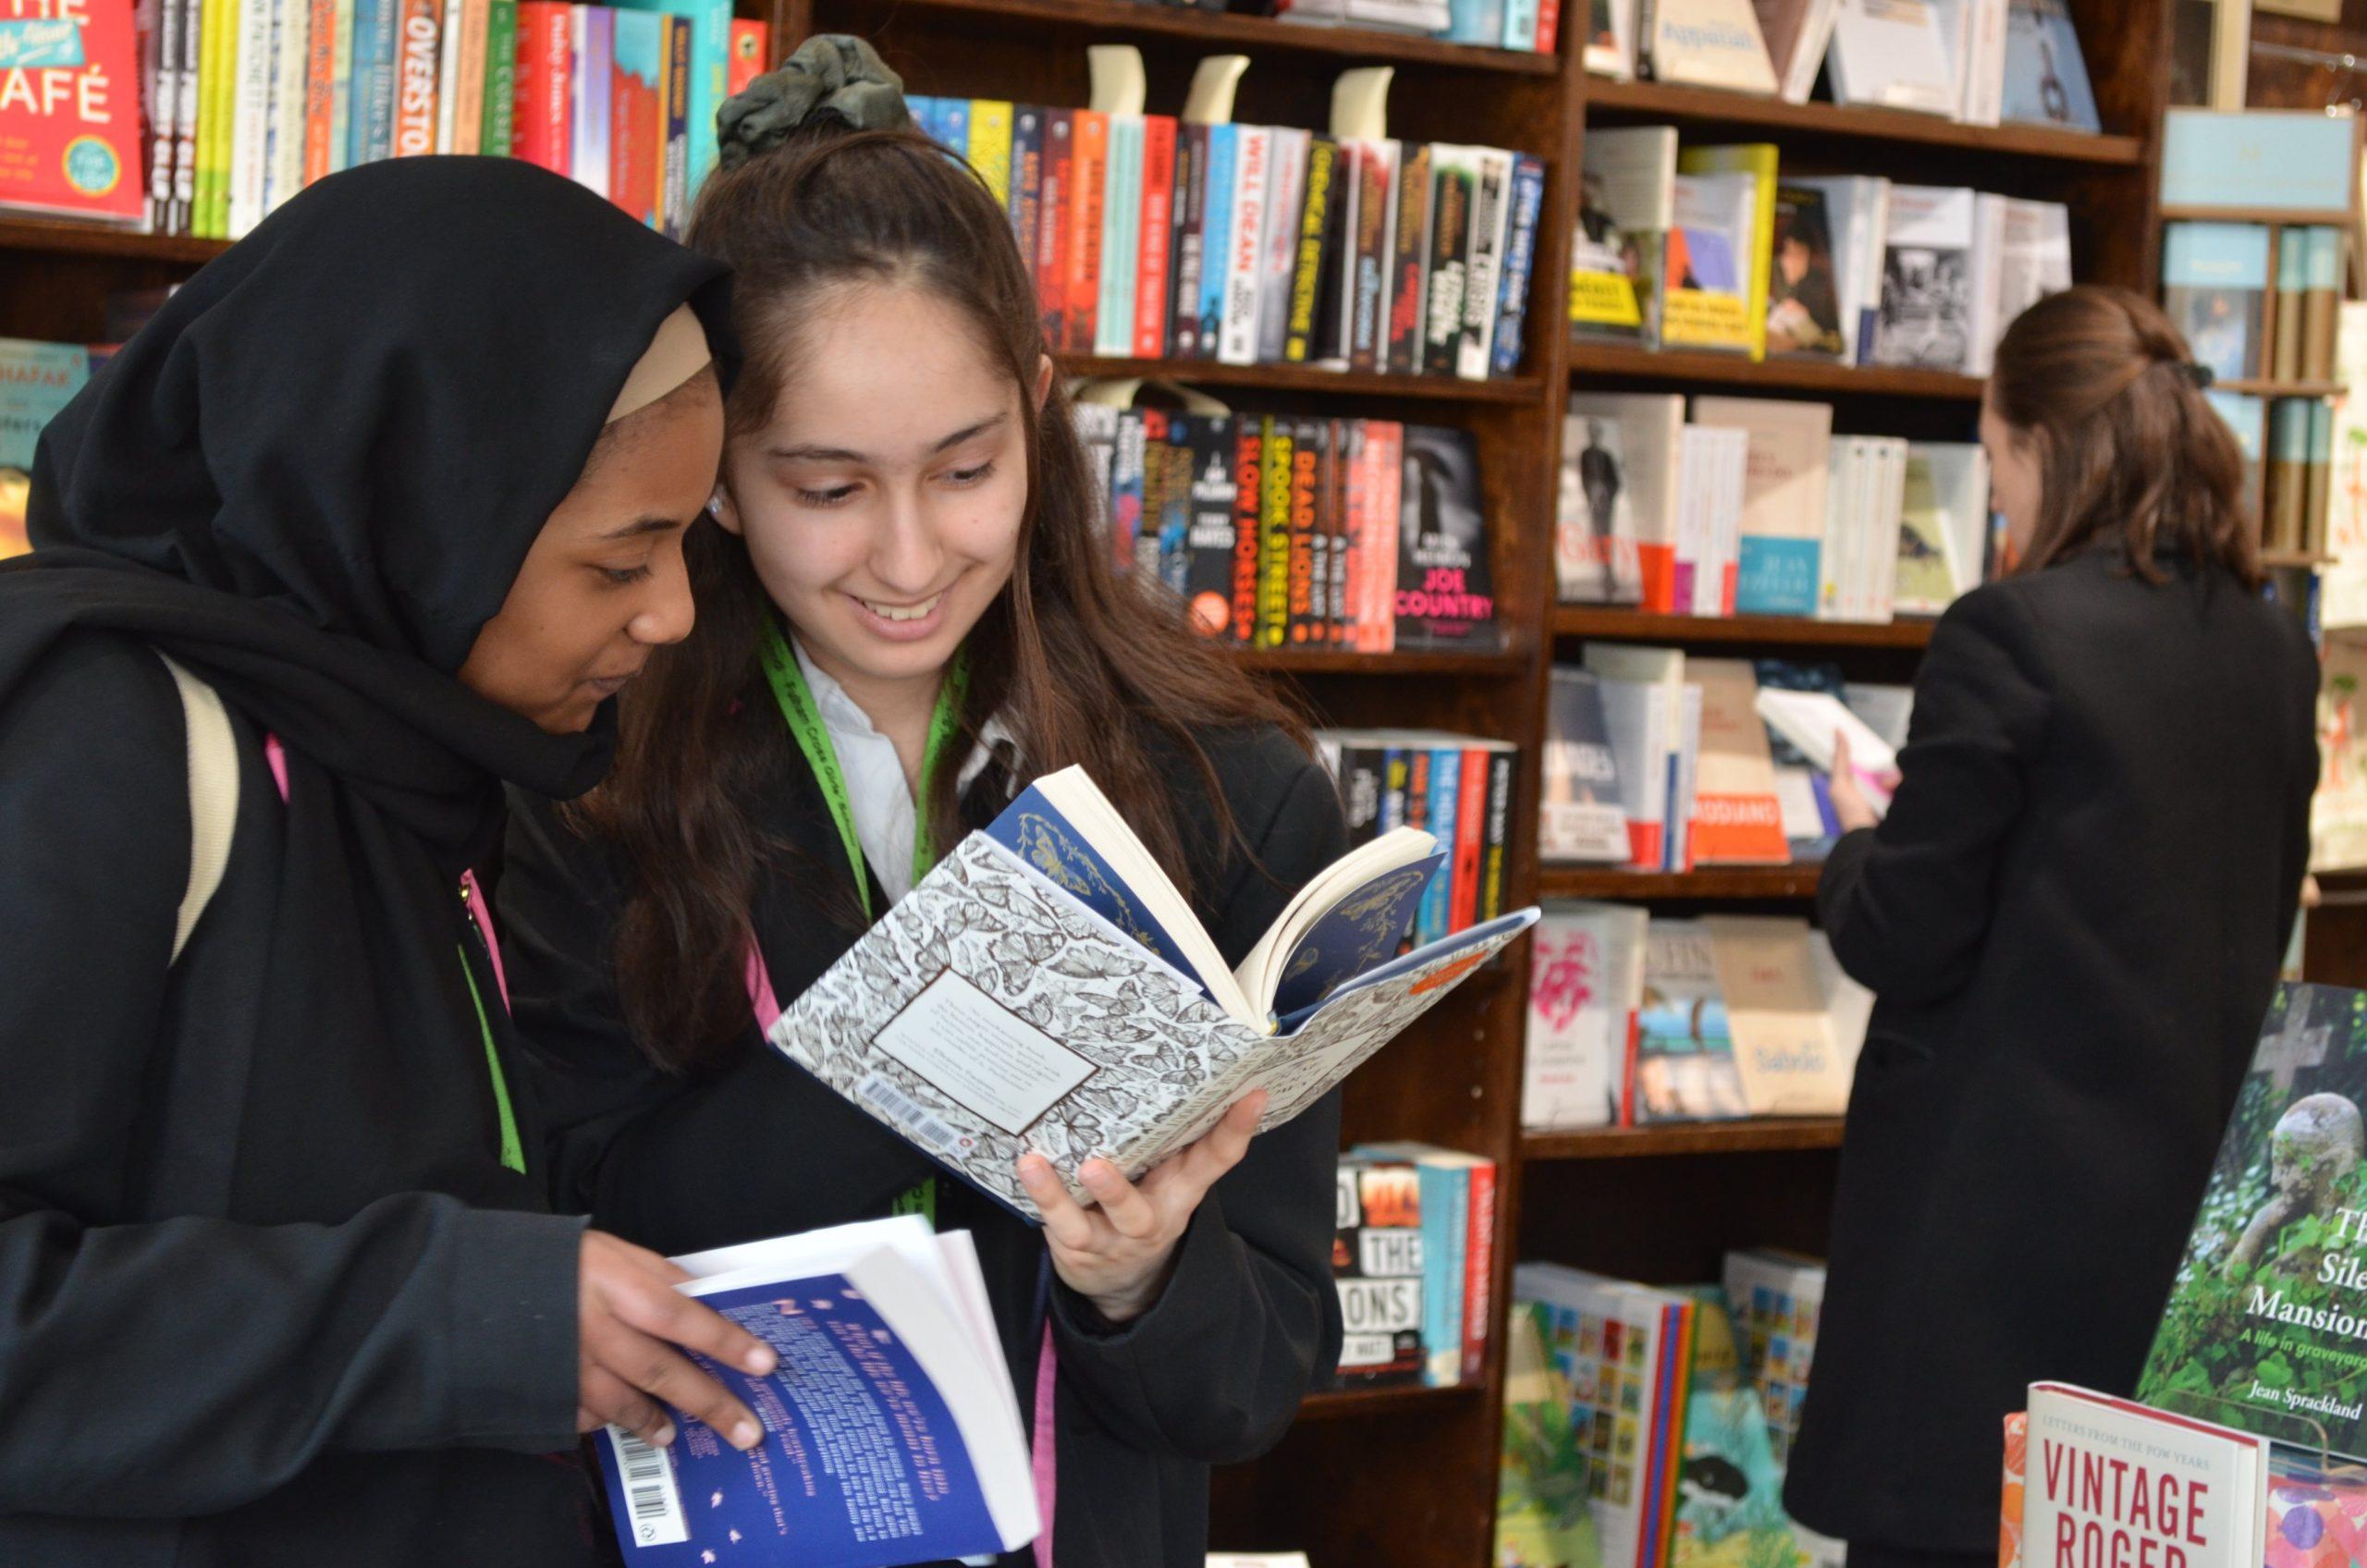 Fulham Cross Girls School